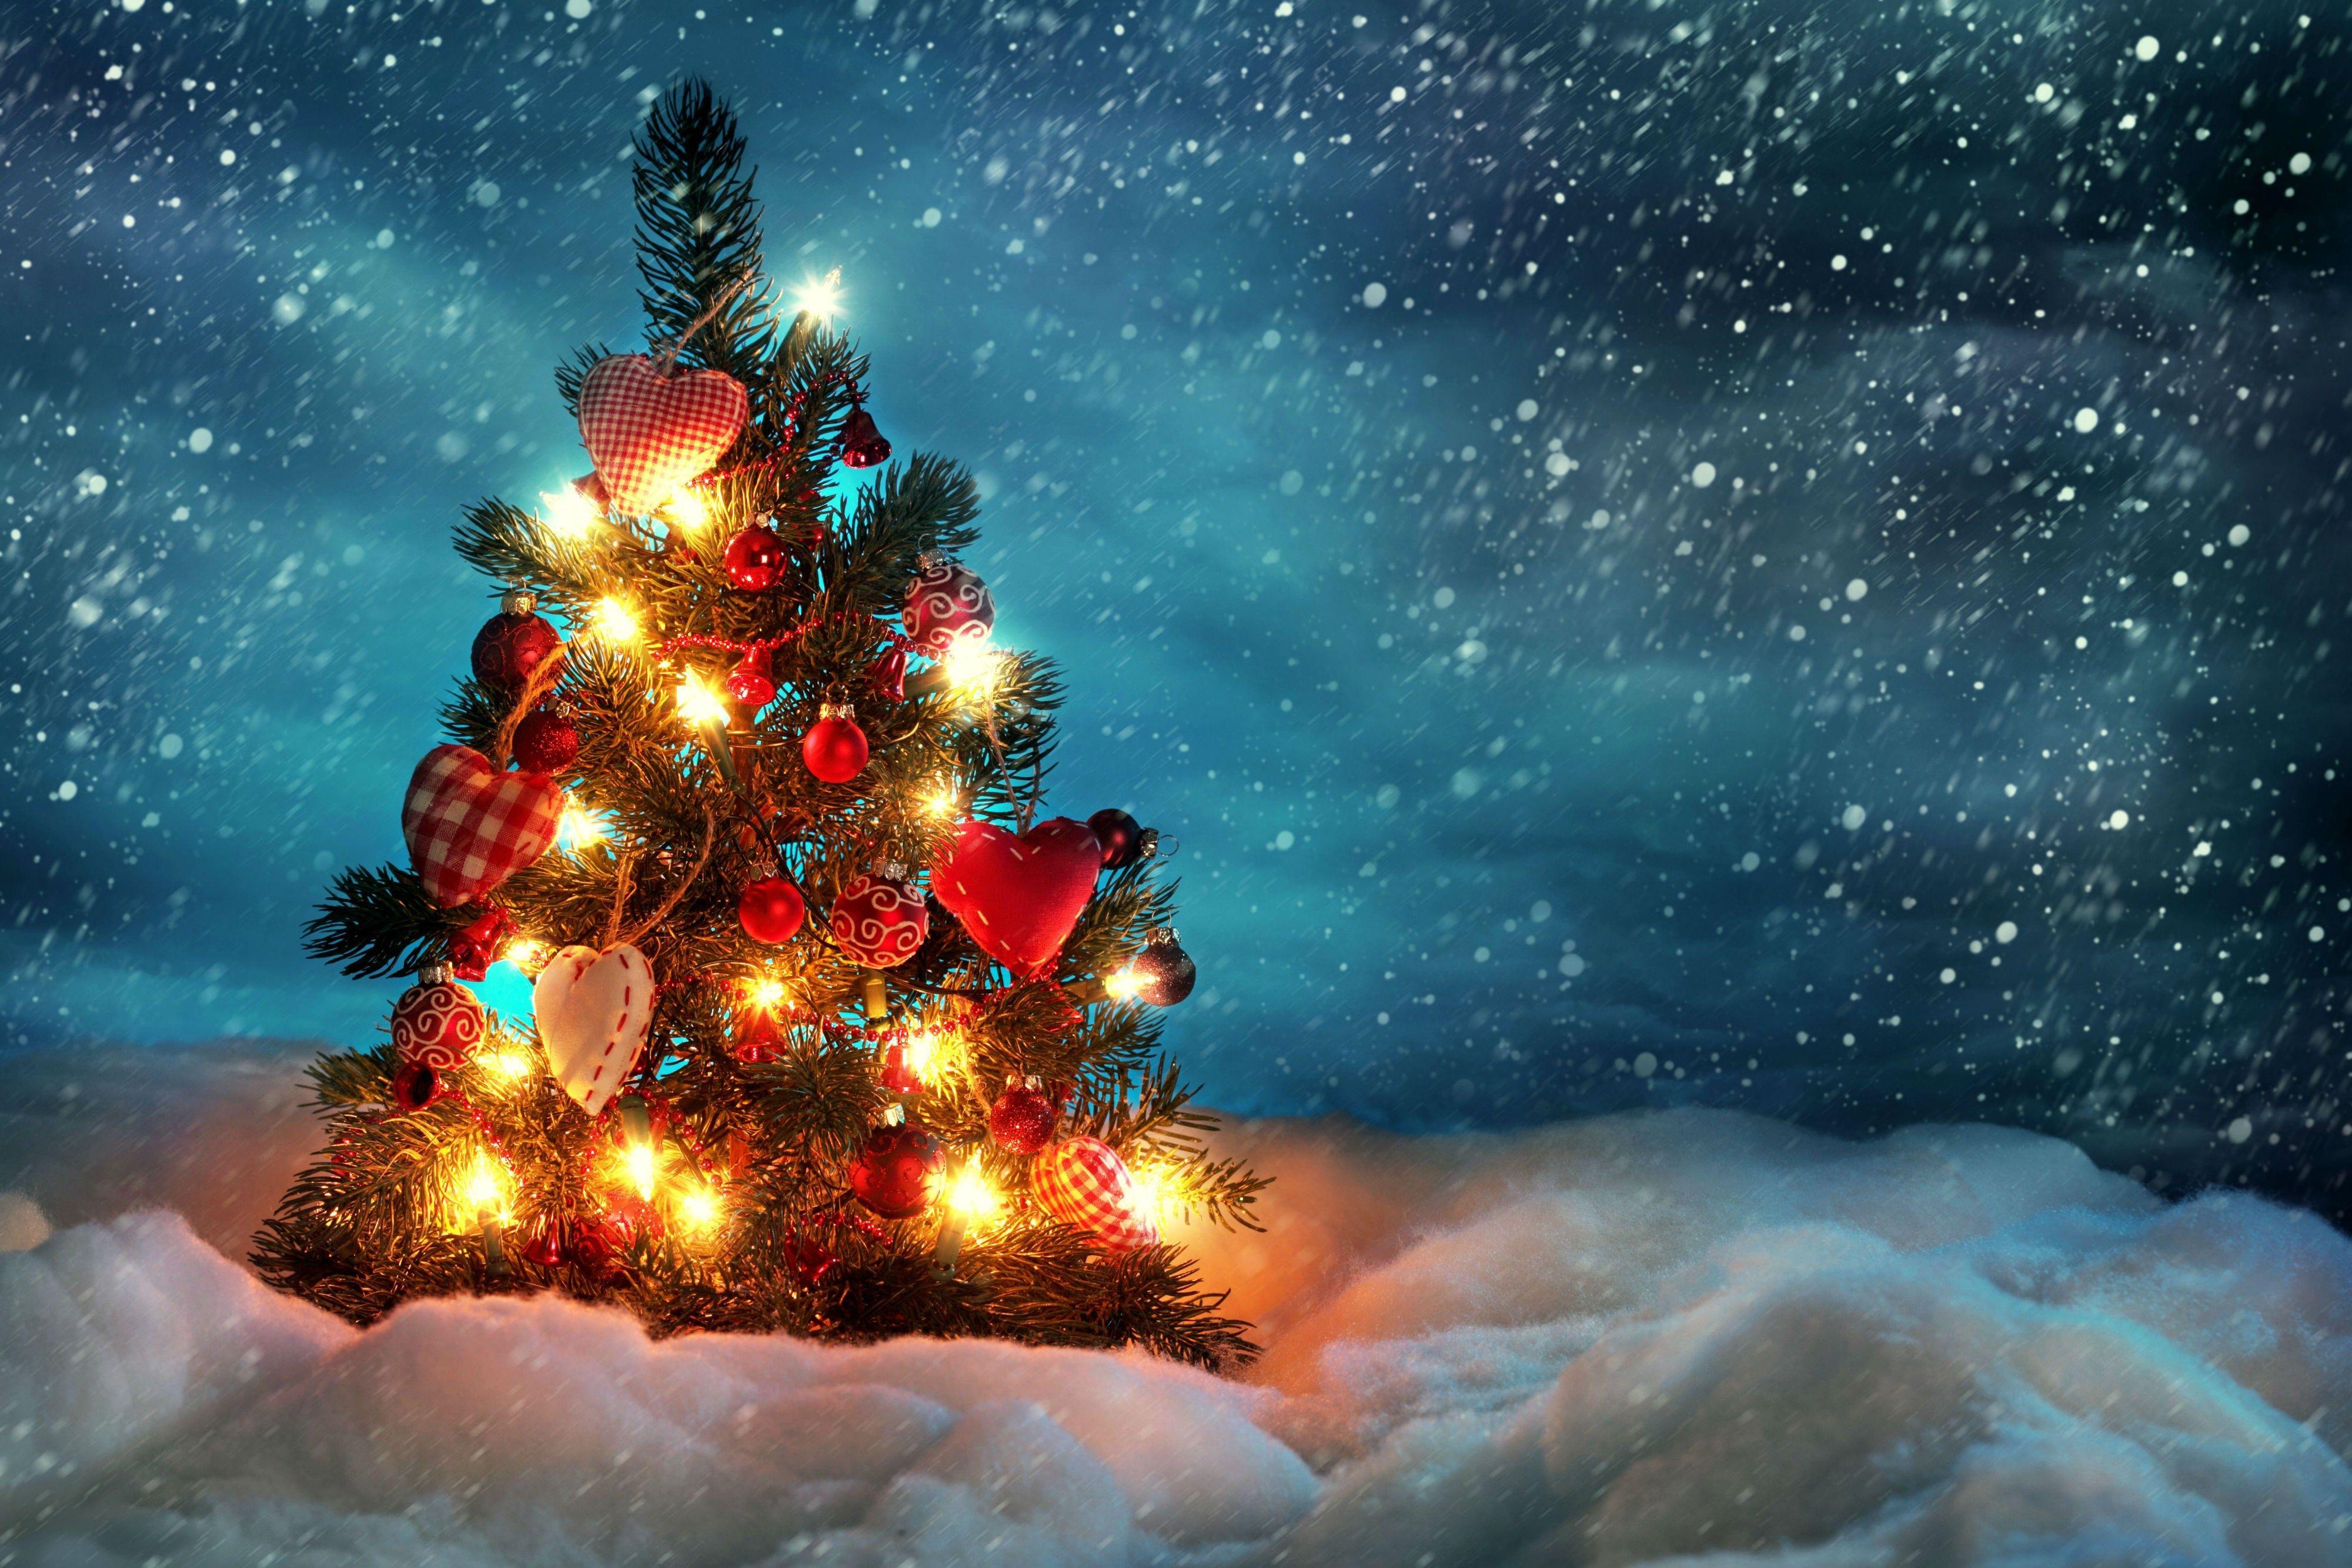 Christmas 4k Wallpaper 4000x2667 Desktop WallpaperChristmas CountdownWinter